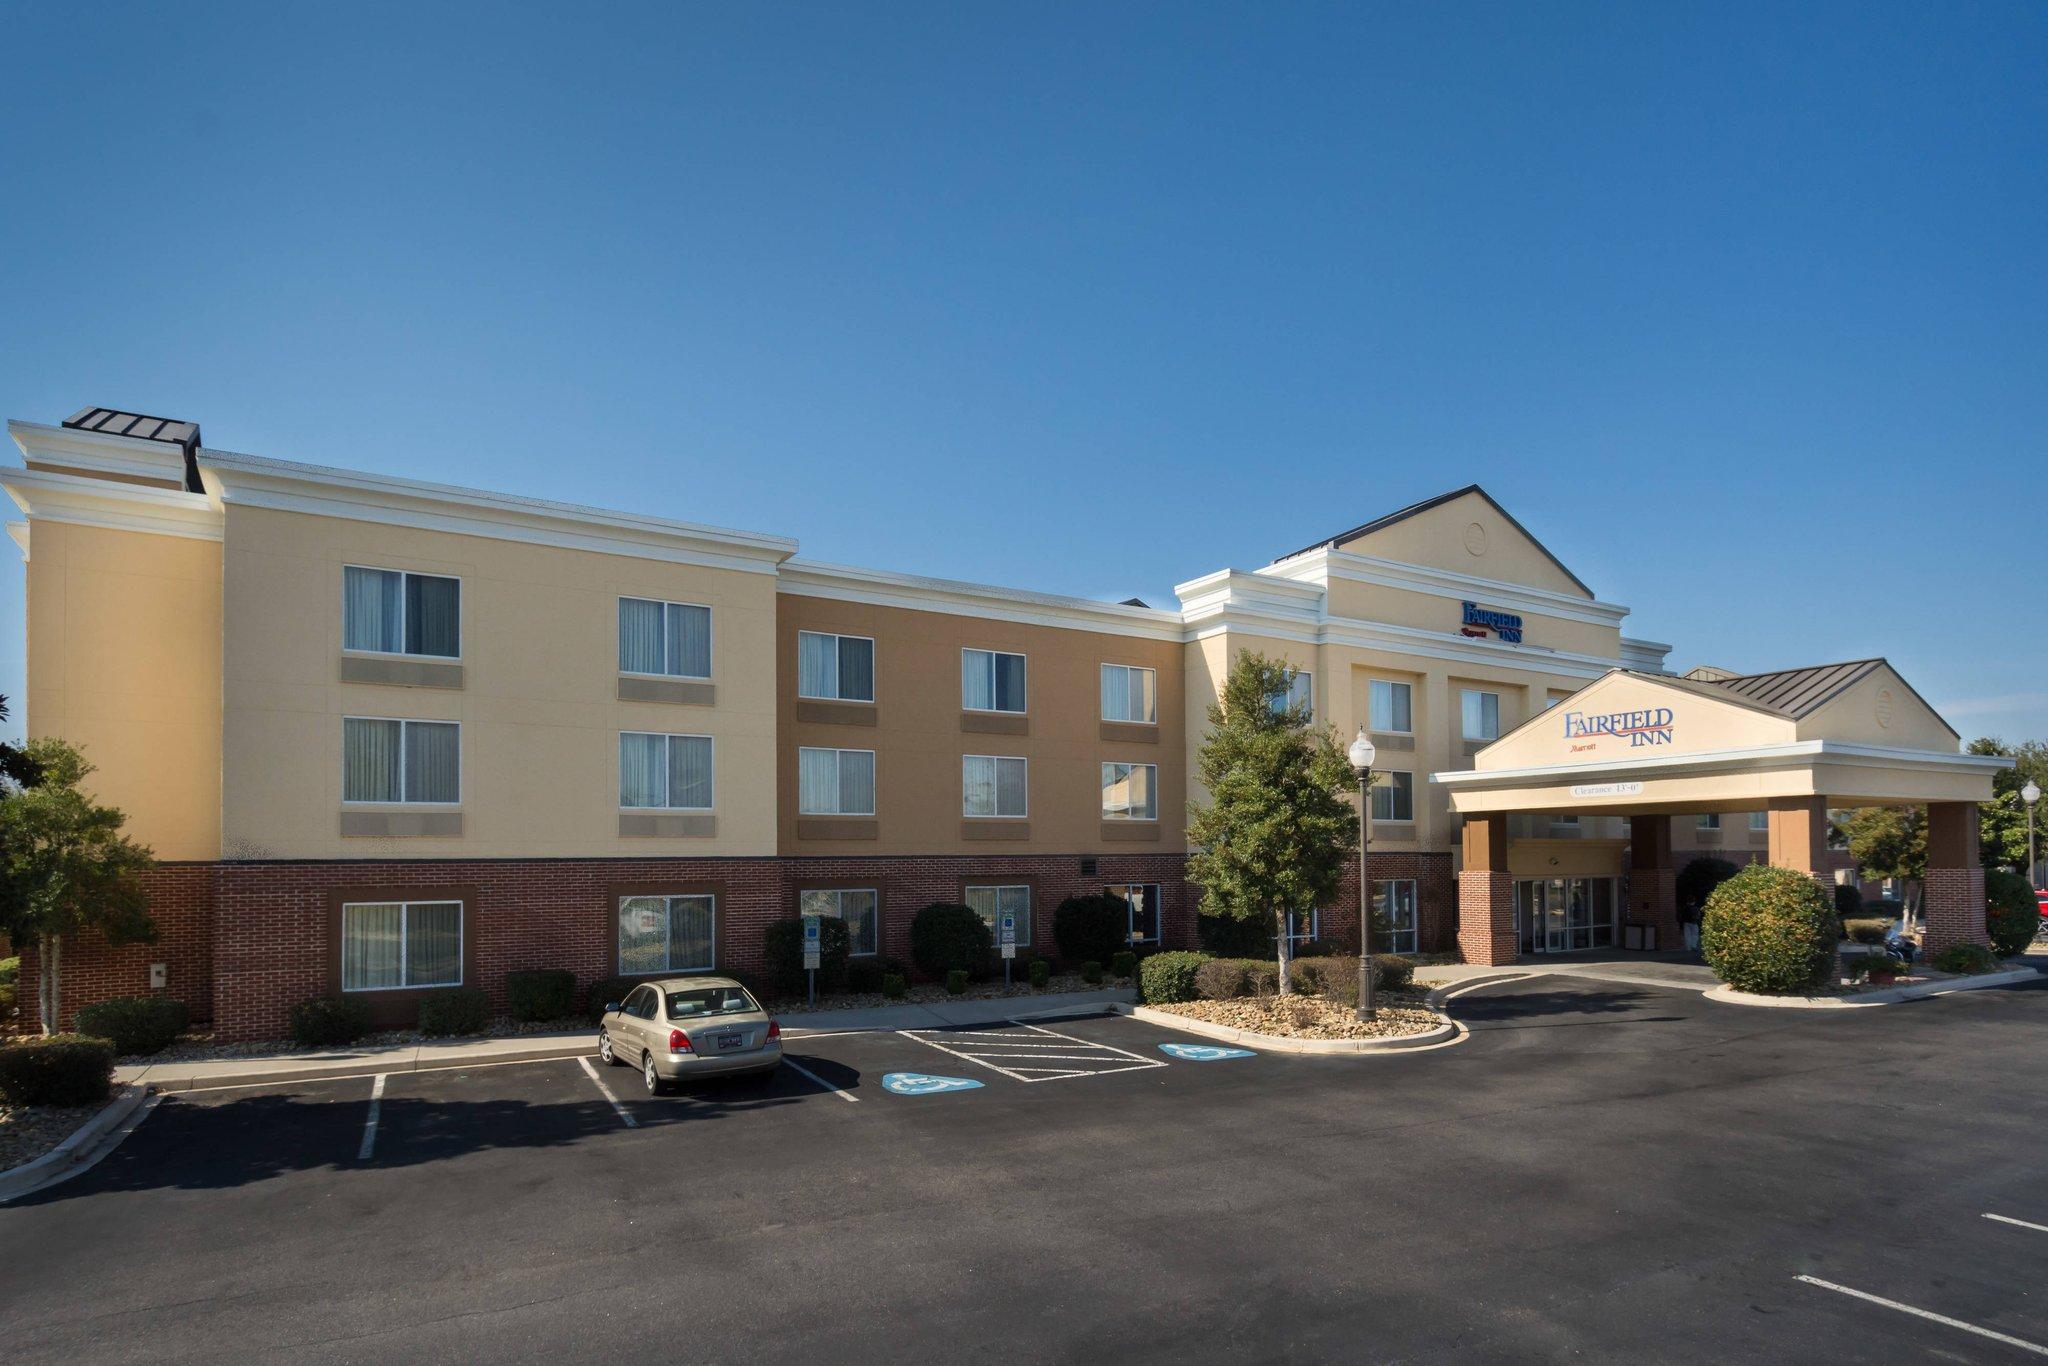 Fairfield Inn by Marriott Hartsville